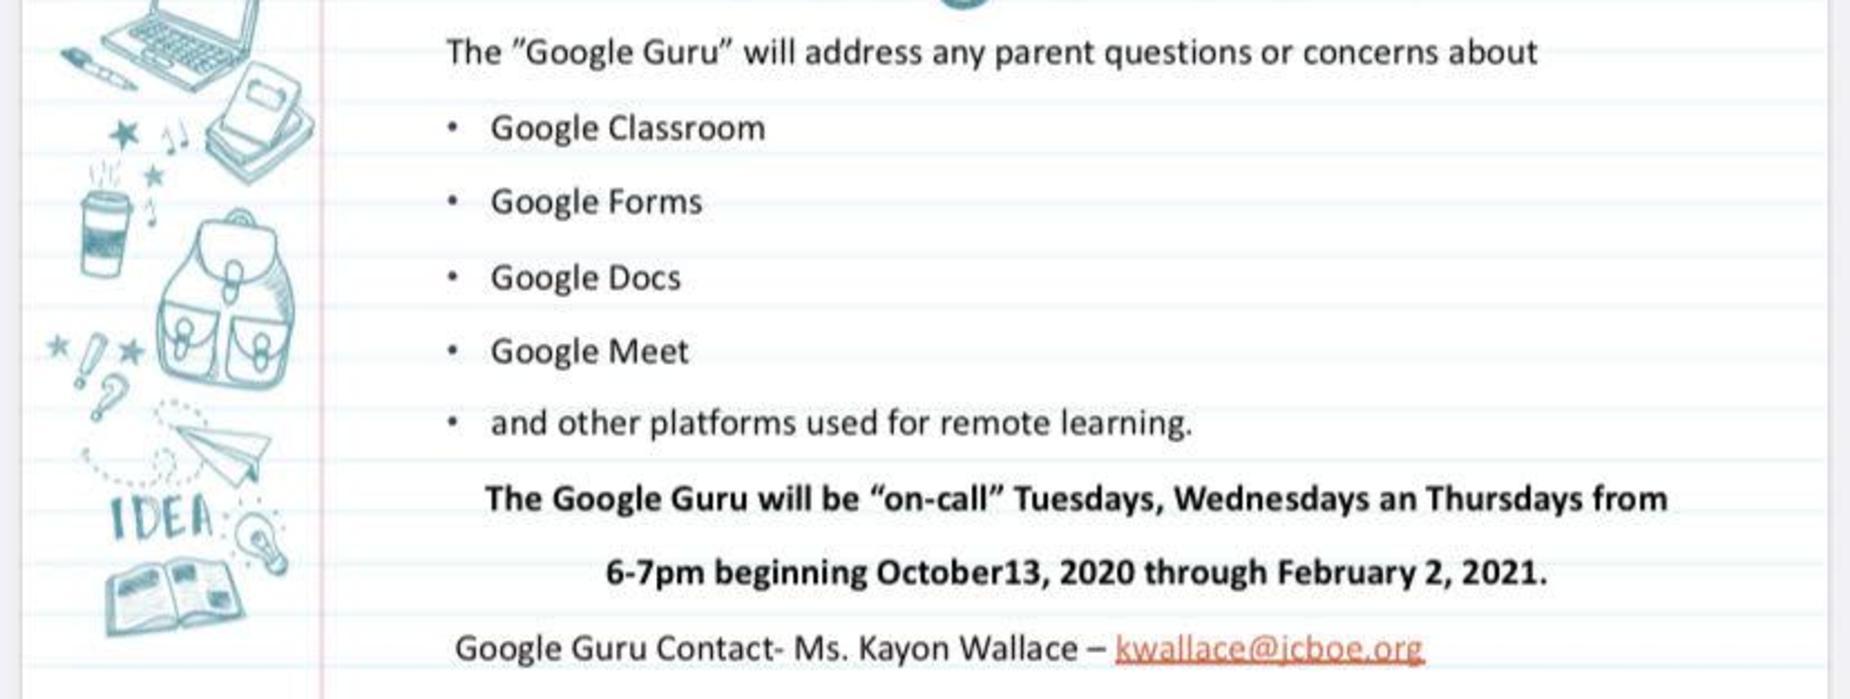 Google Guru kwallace@jcboe.org